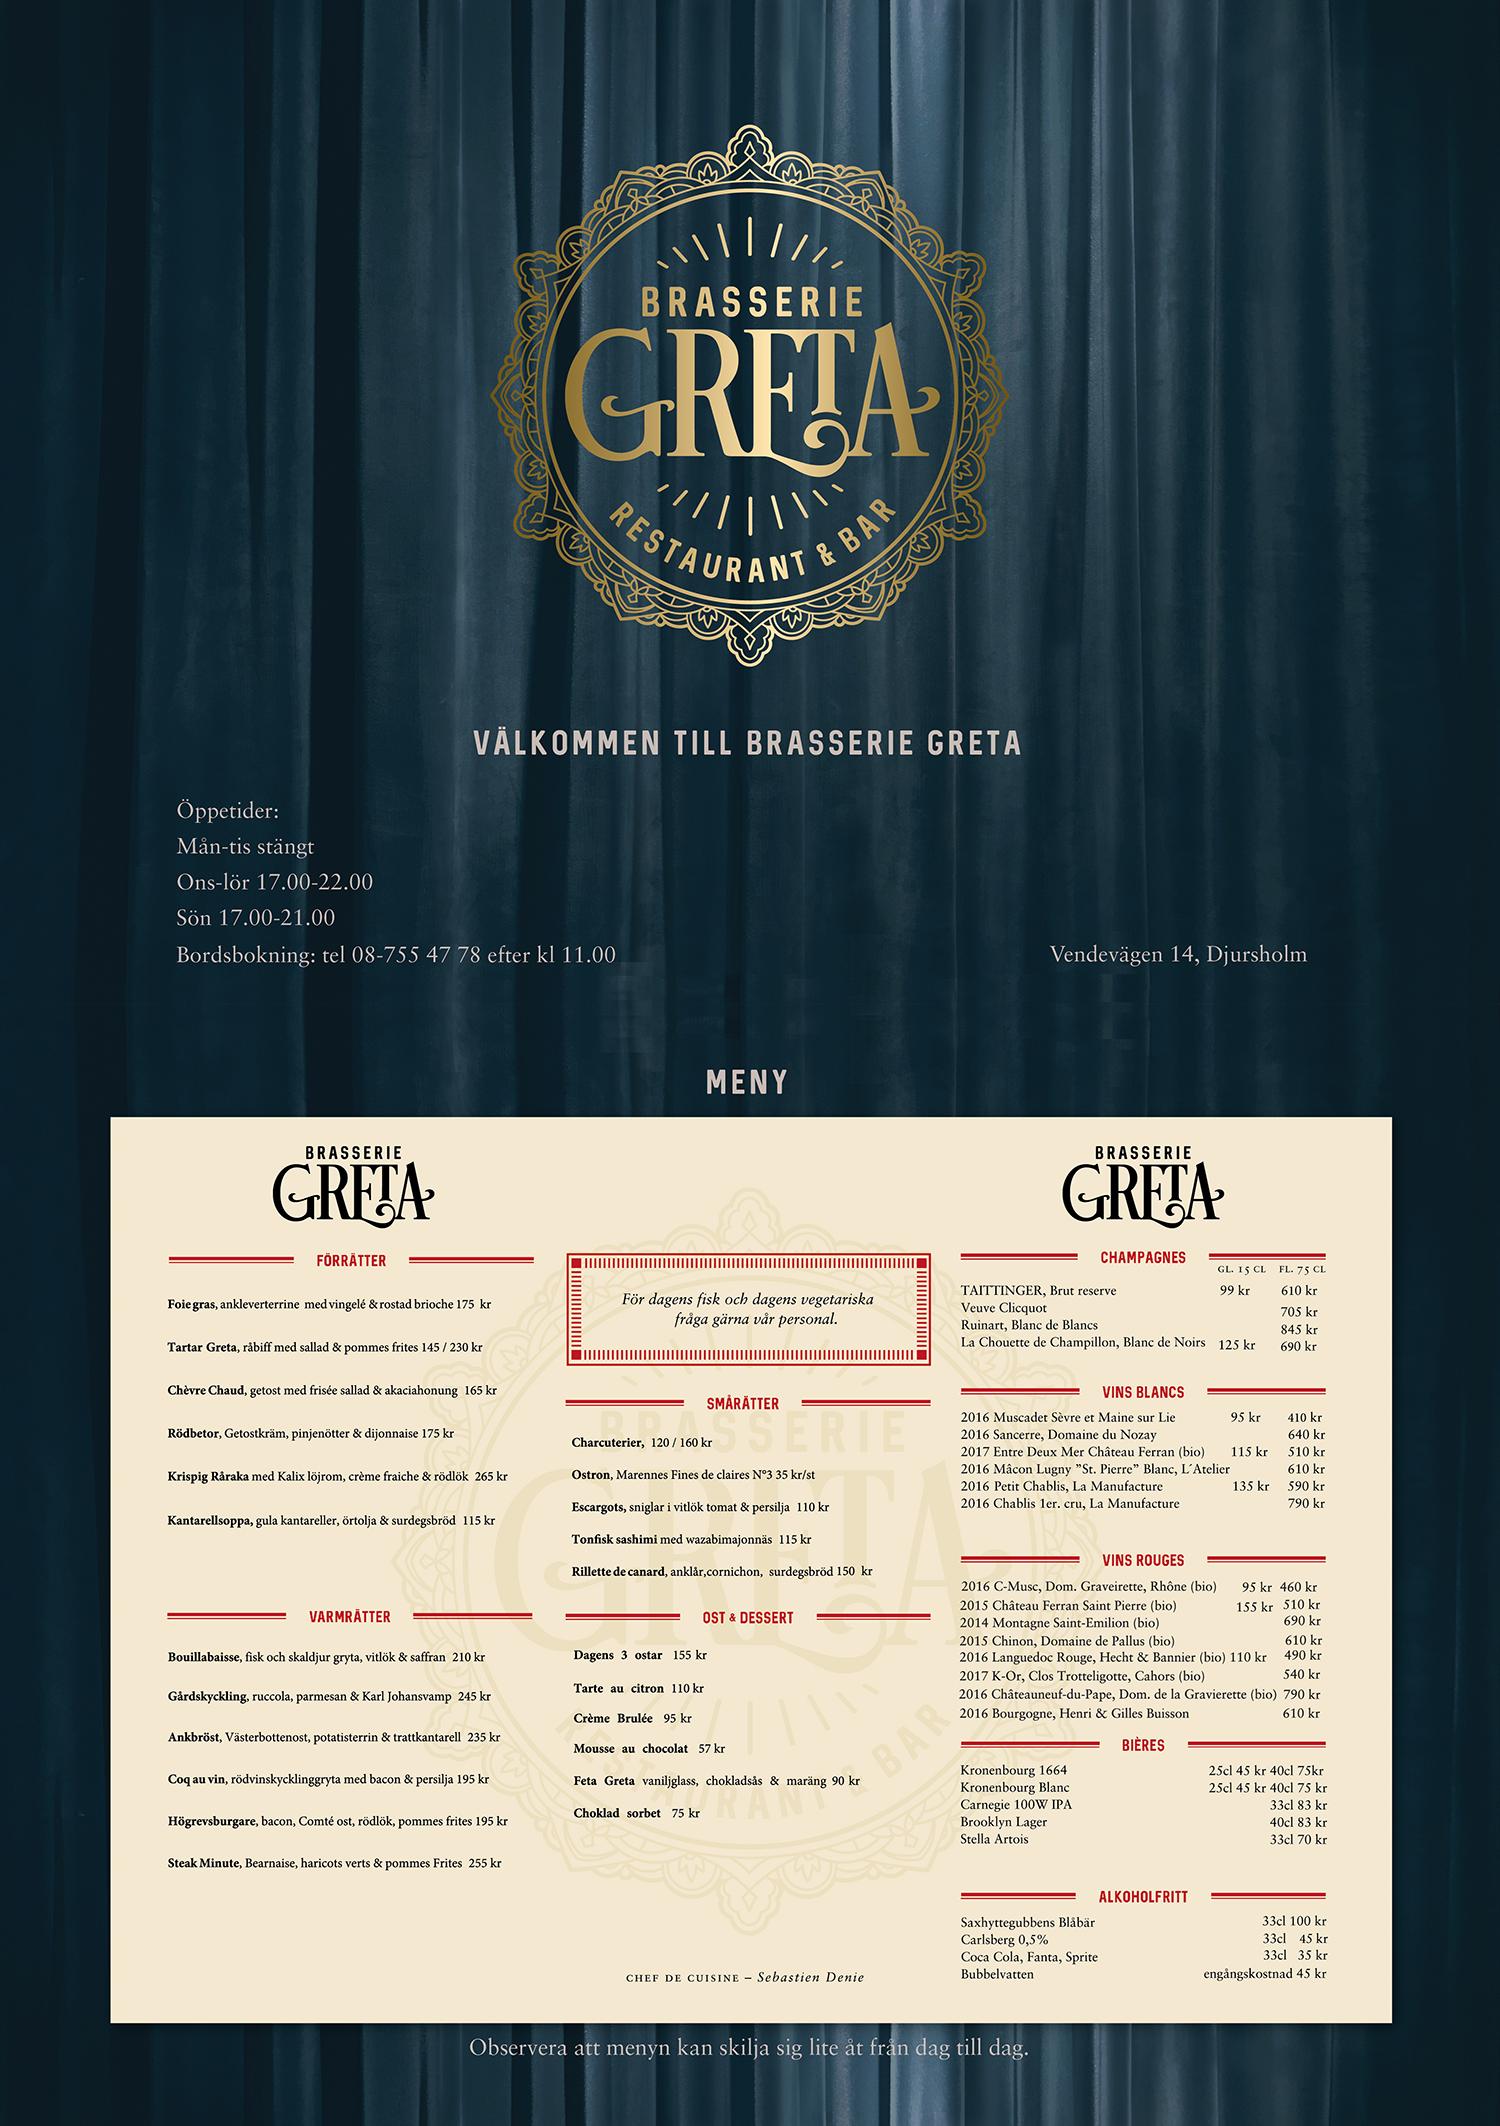 brasserie greta.png